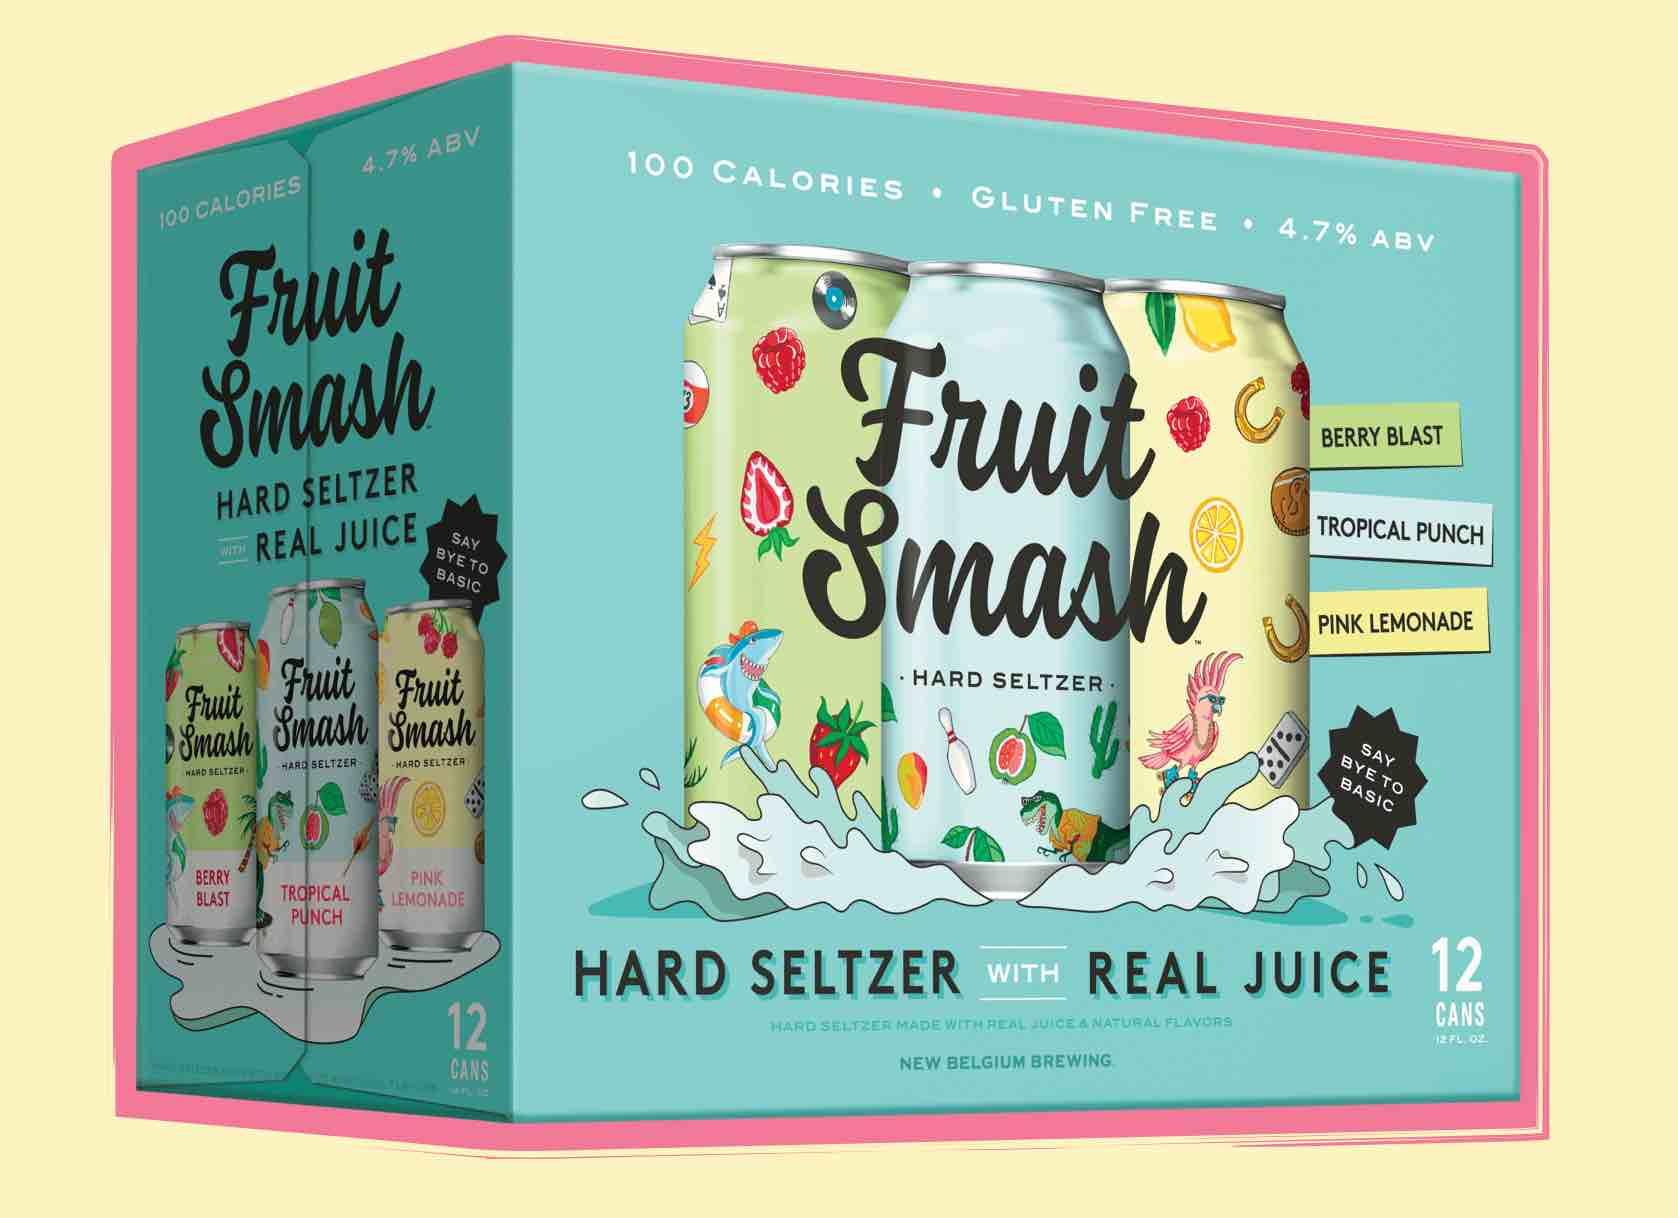 New Belgium Brewing Fruit Smash Hard Seltzer Variety Pack